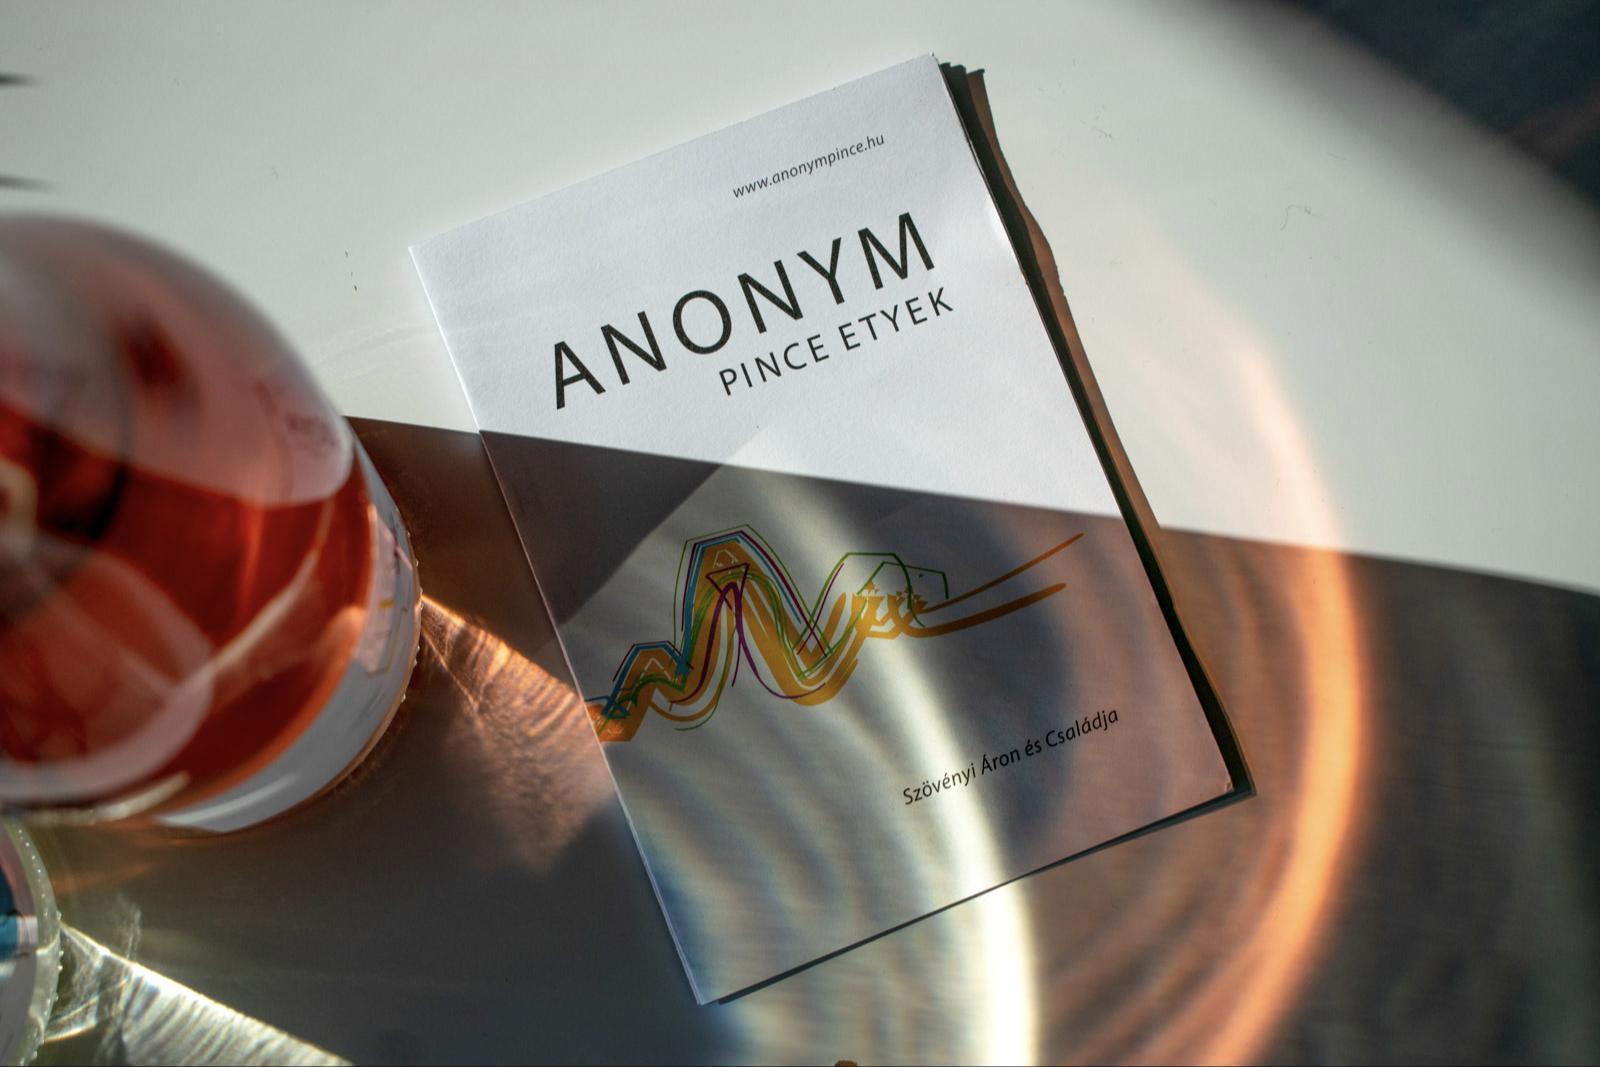 Anonym Pince album